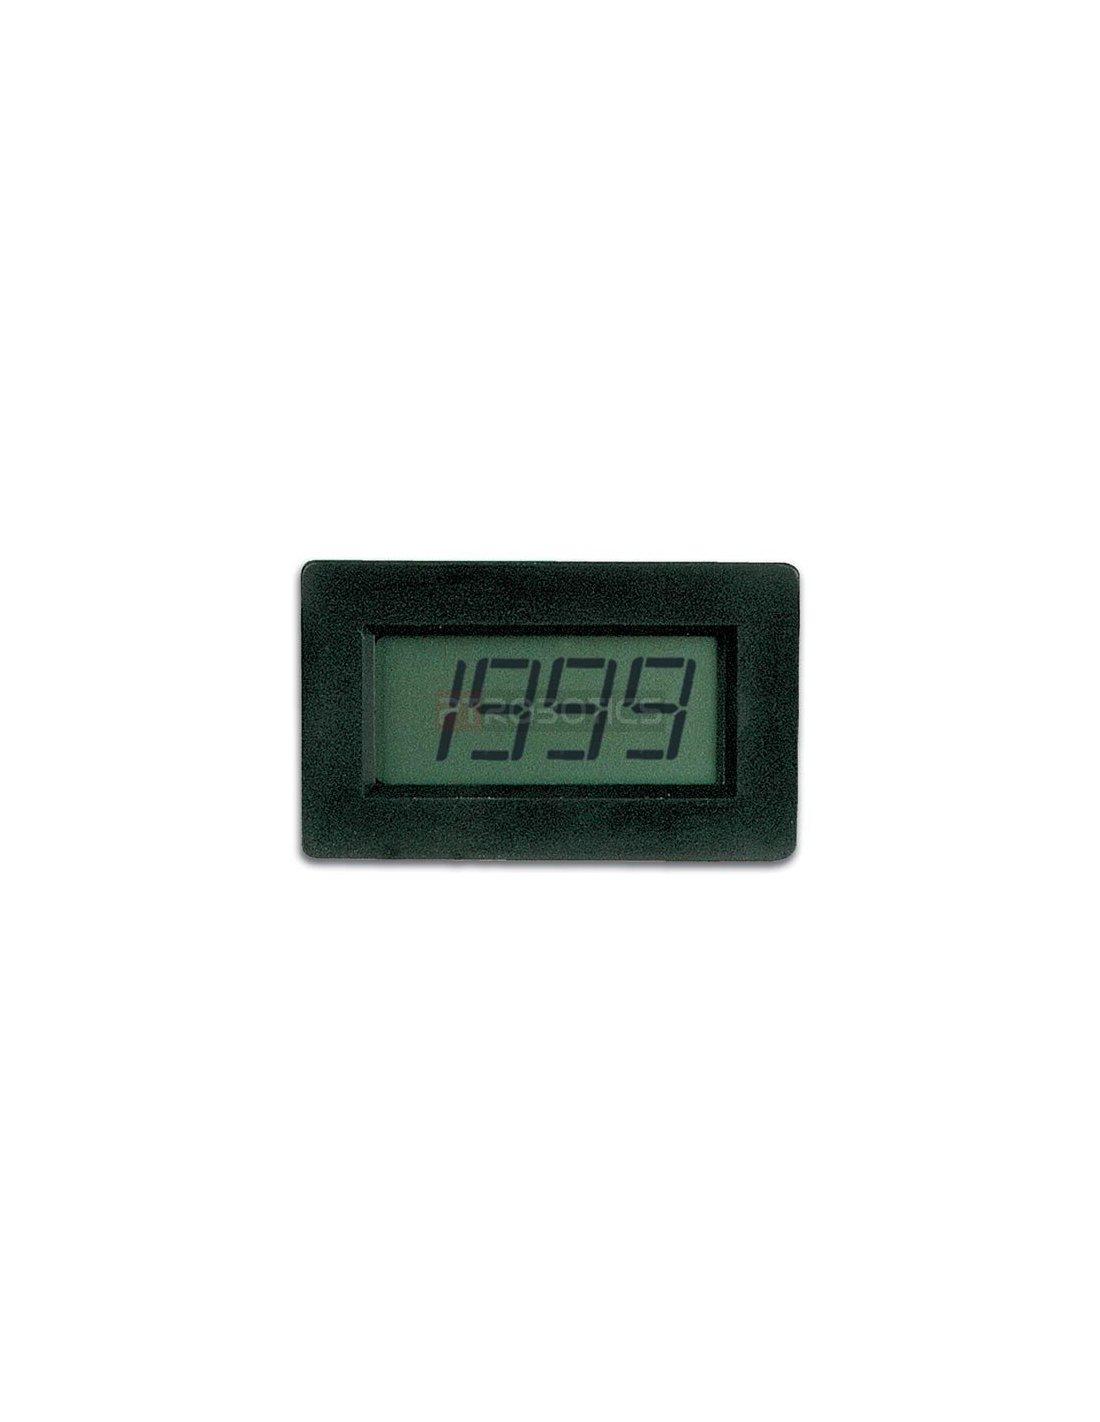 Lcd Panel Meter : Digital panel meter lcd velleman pmlcdl